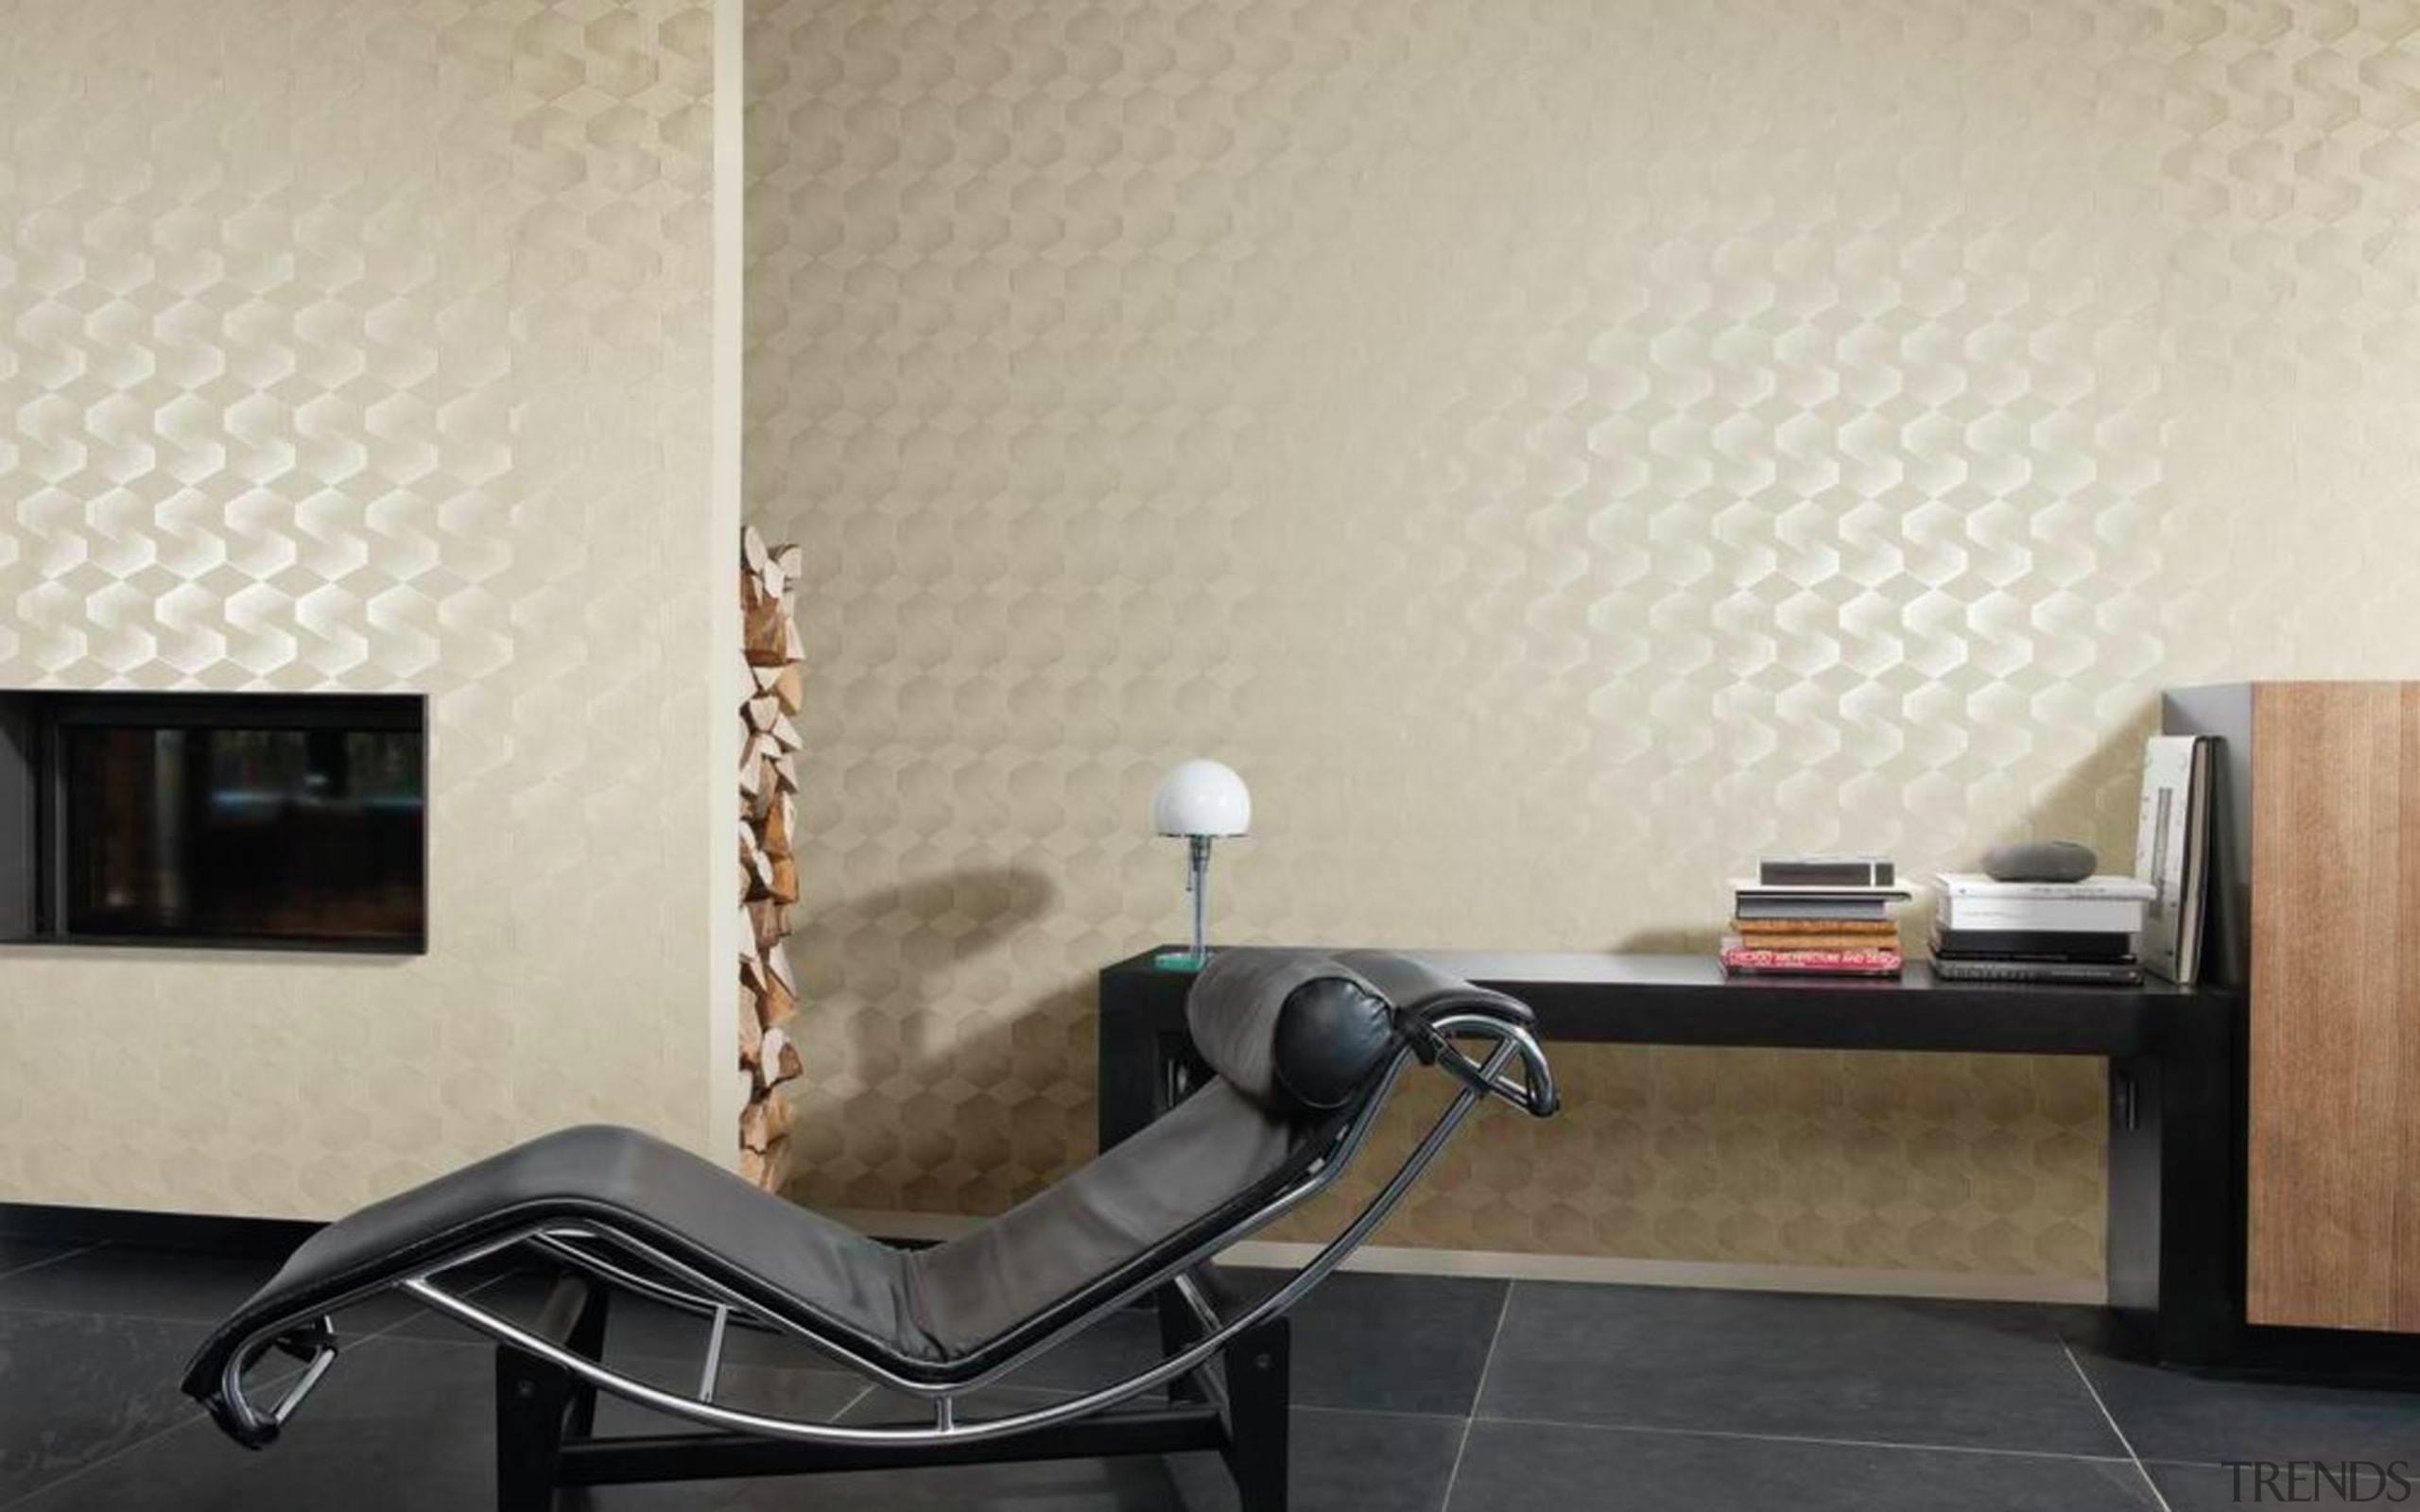 Saphyr Roomset - Saphyr II Range - angle angle, chair, floor, flooring, furniture, interior design, product, product design, property, wall, gray